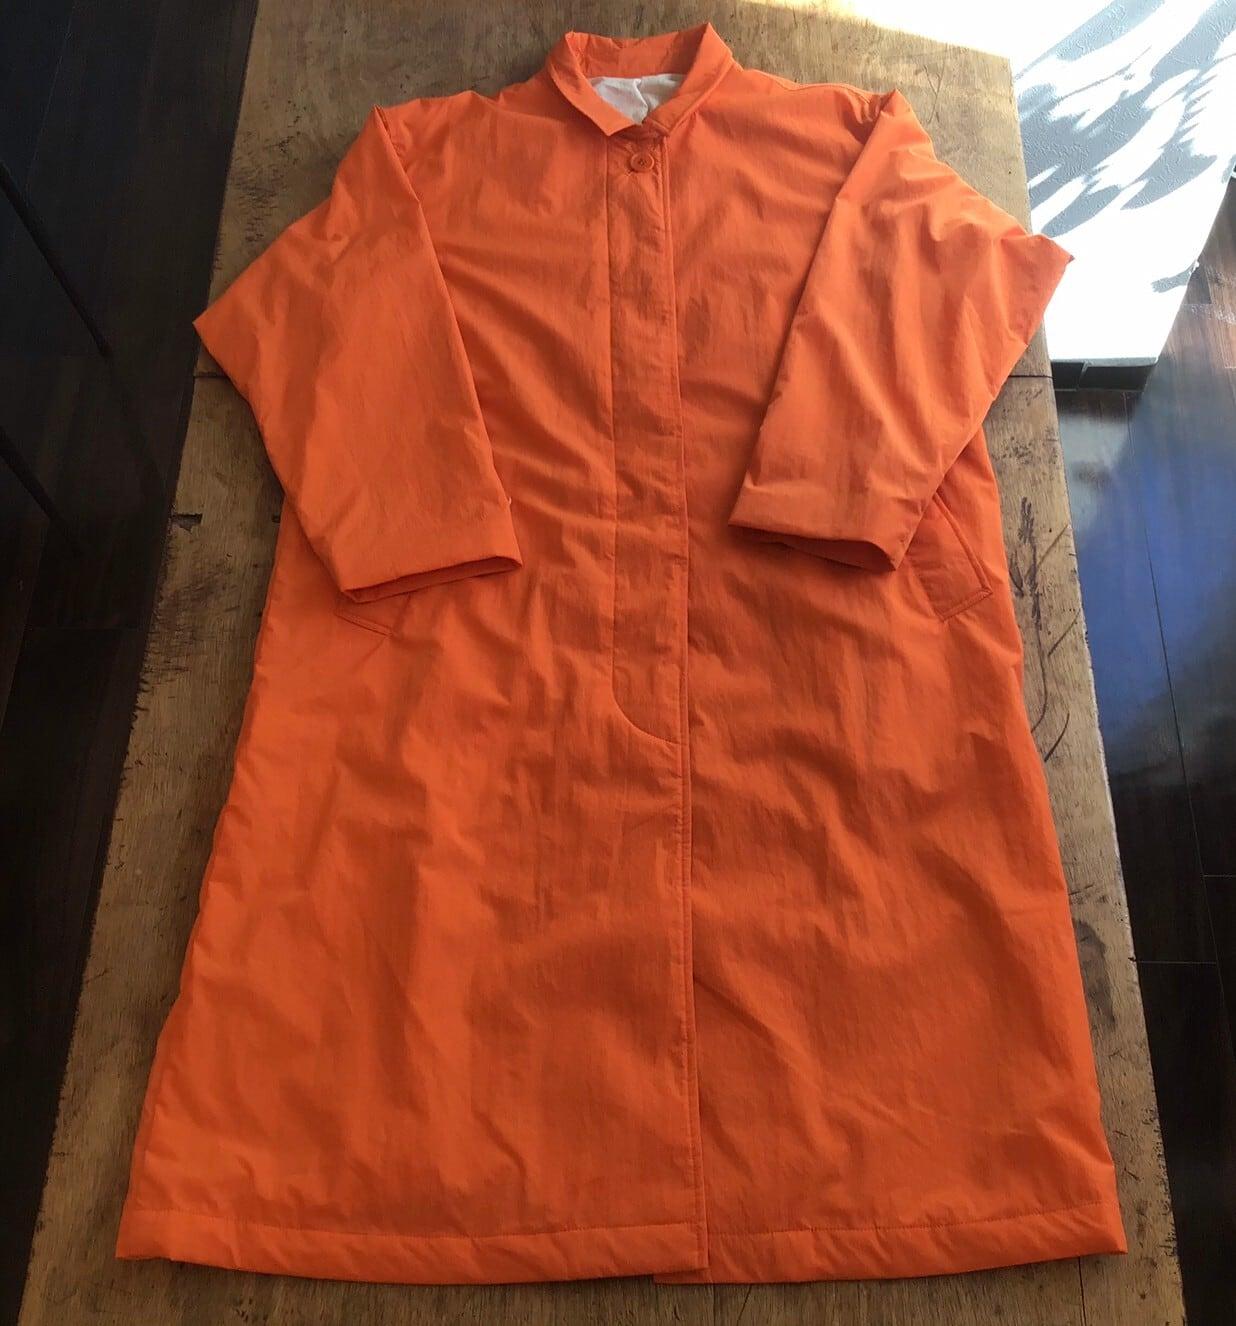 UNUSED US1875 color orange size 1